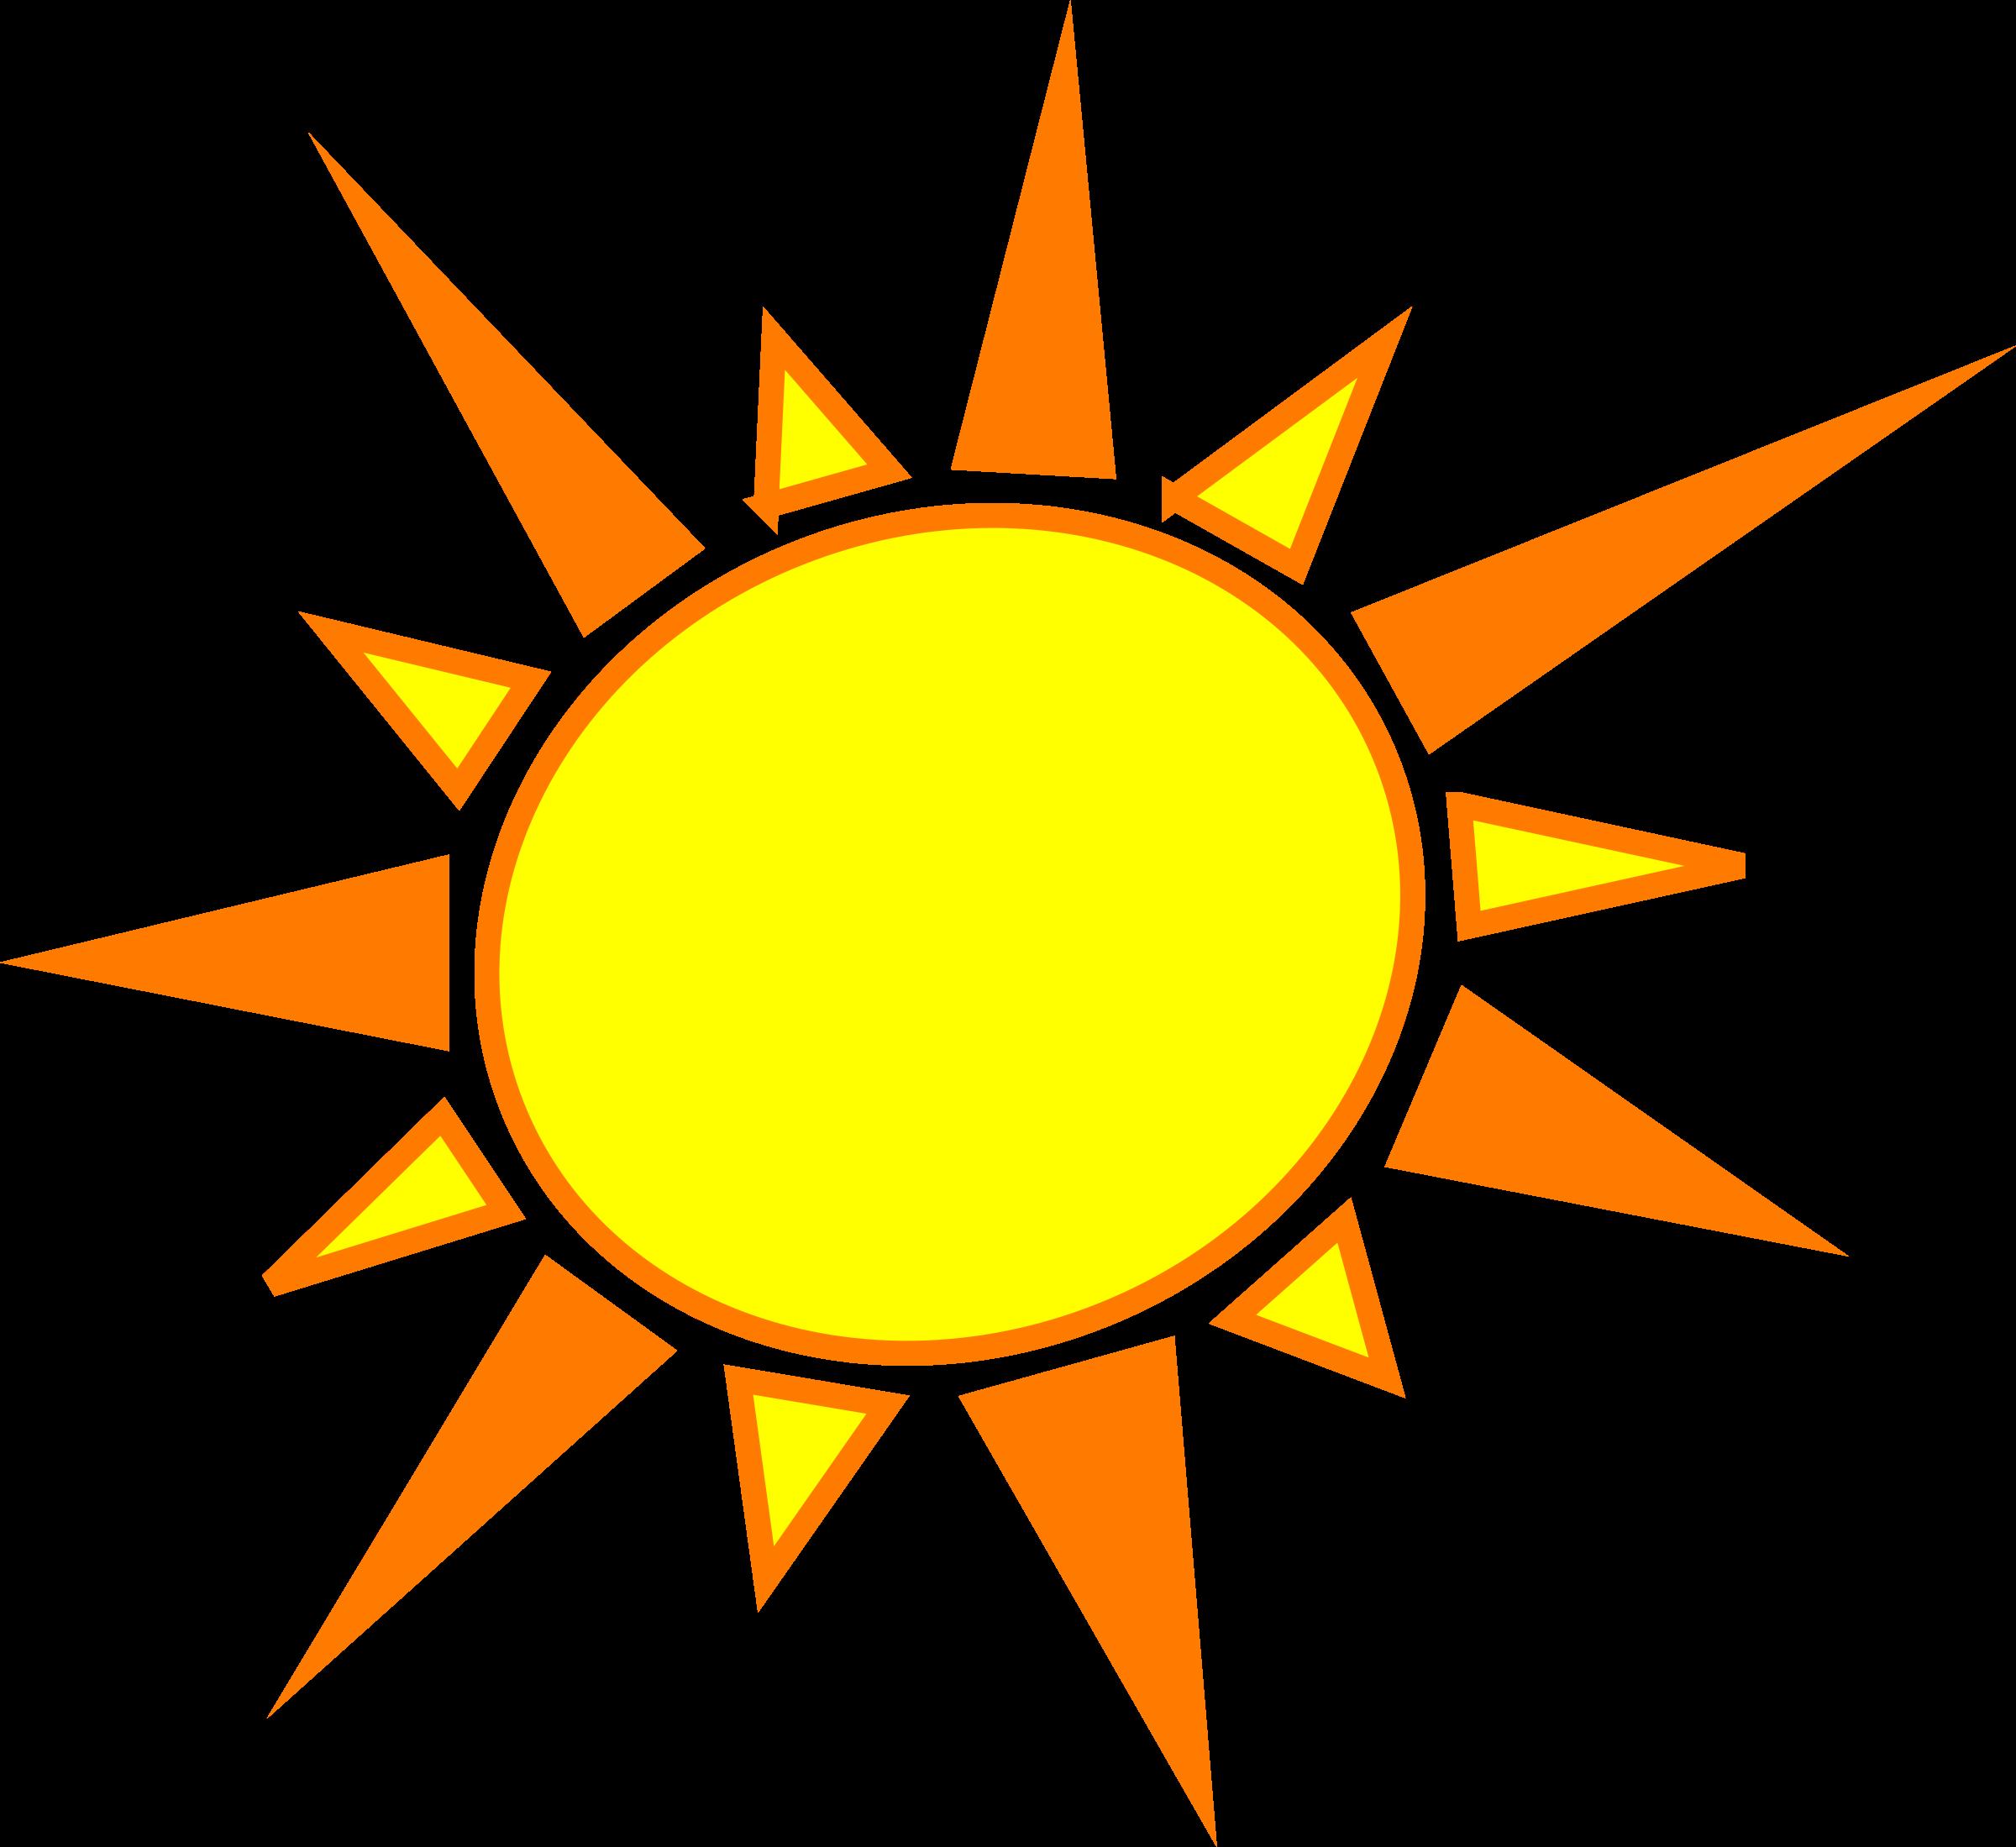 Clipart sun heart. Yellow and orange big